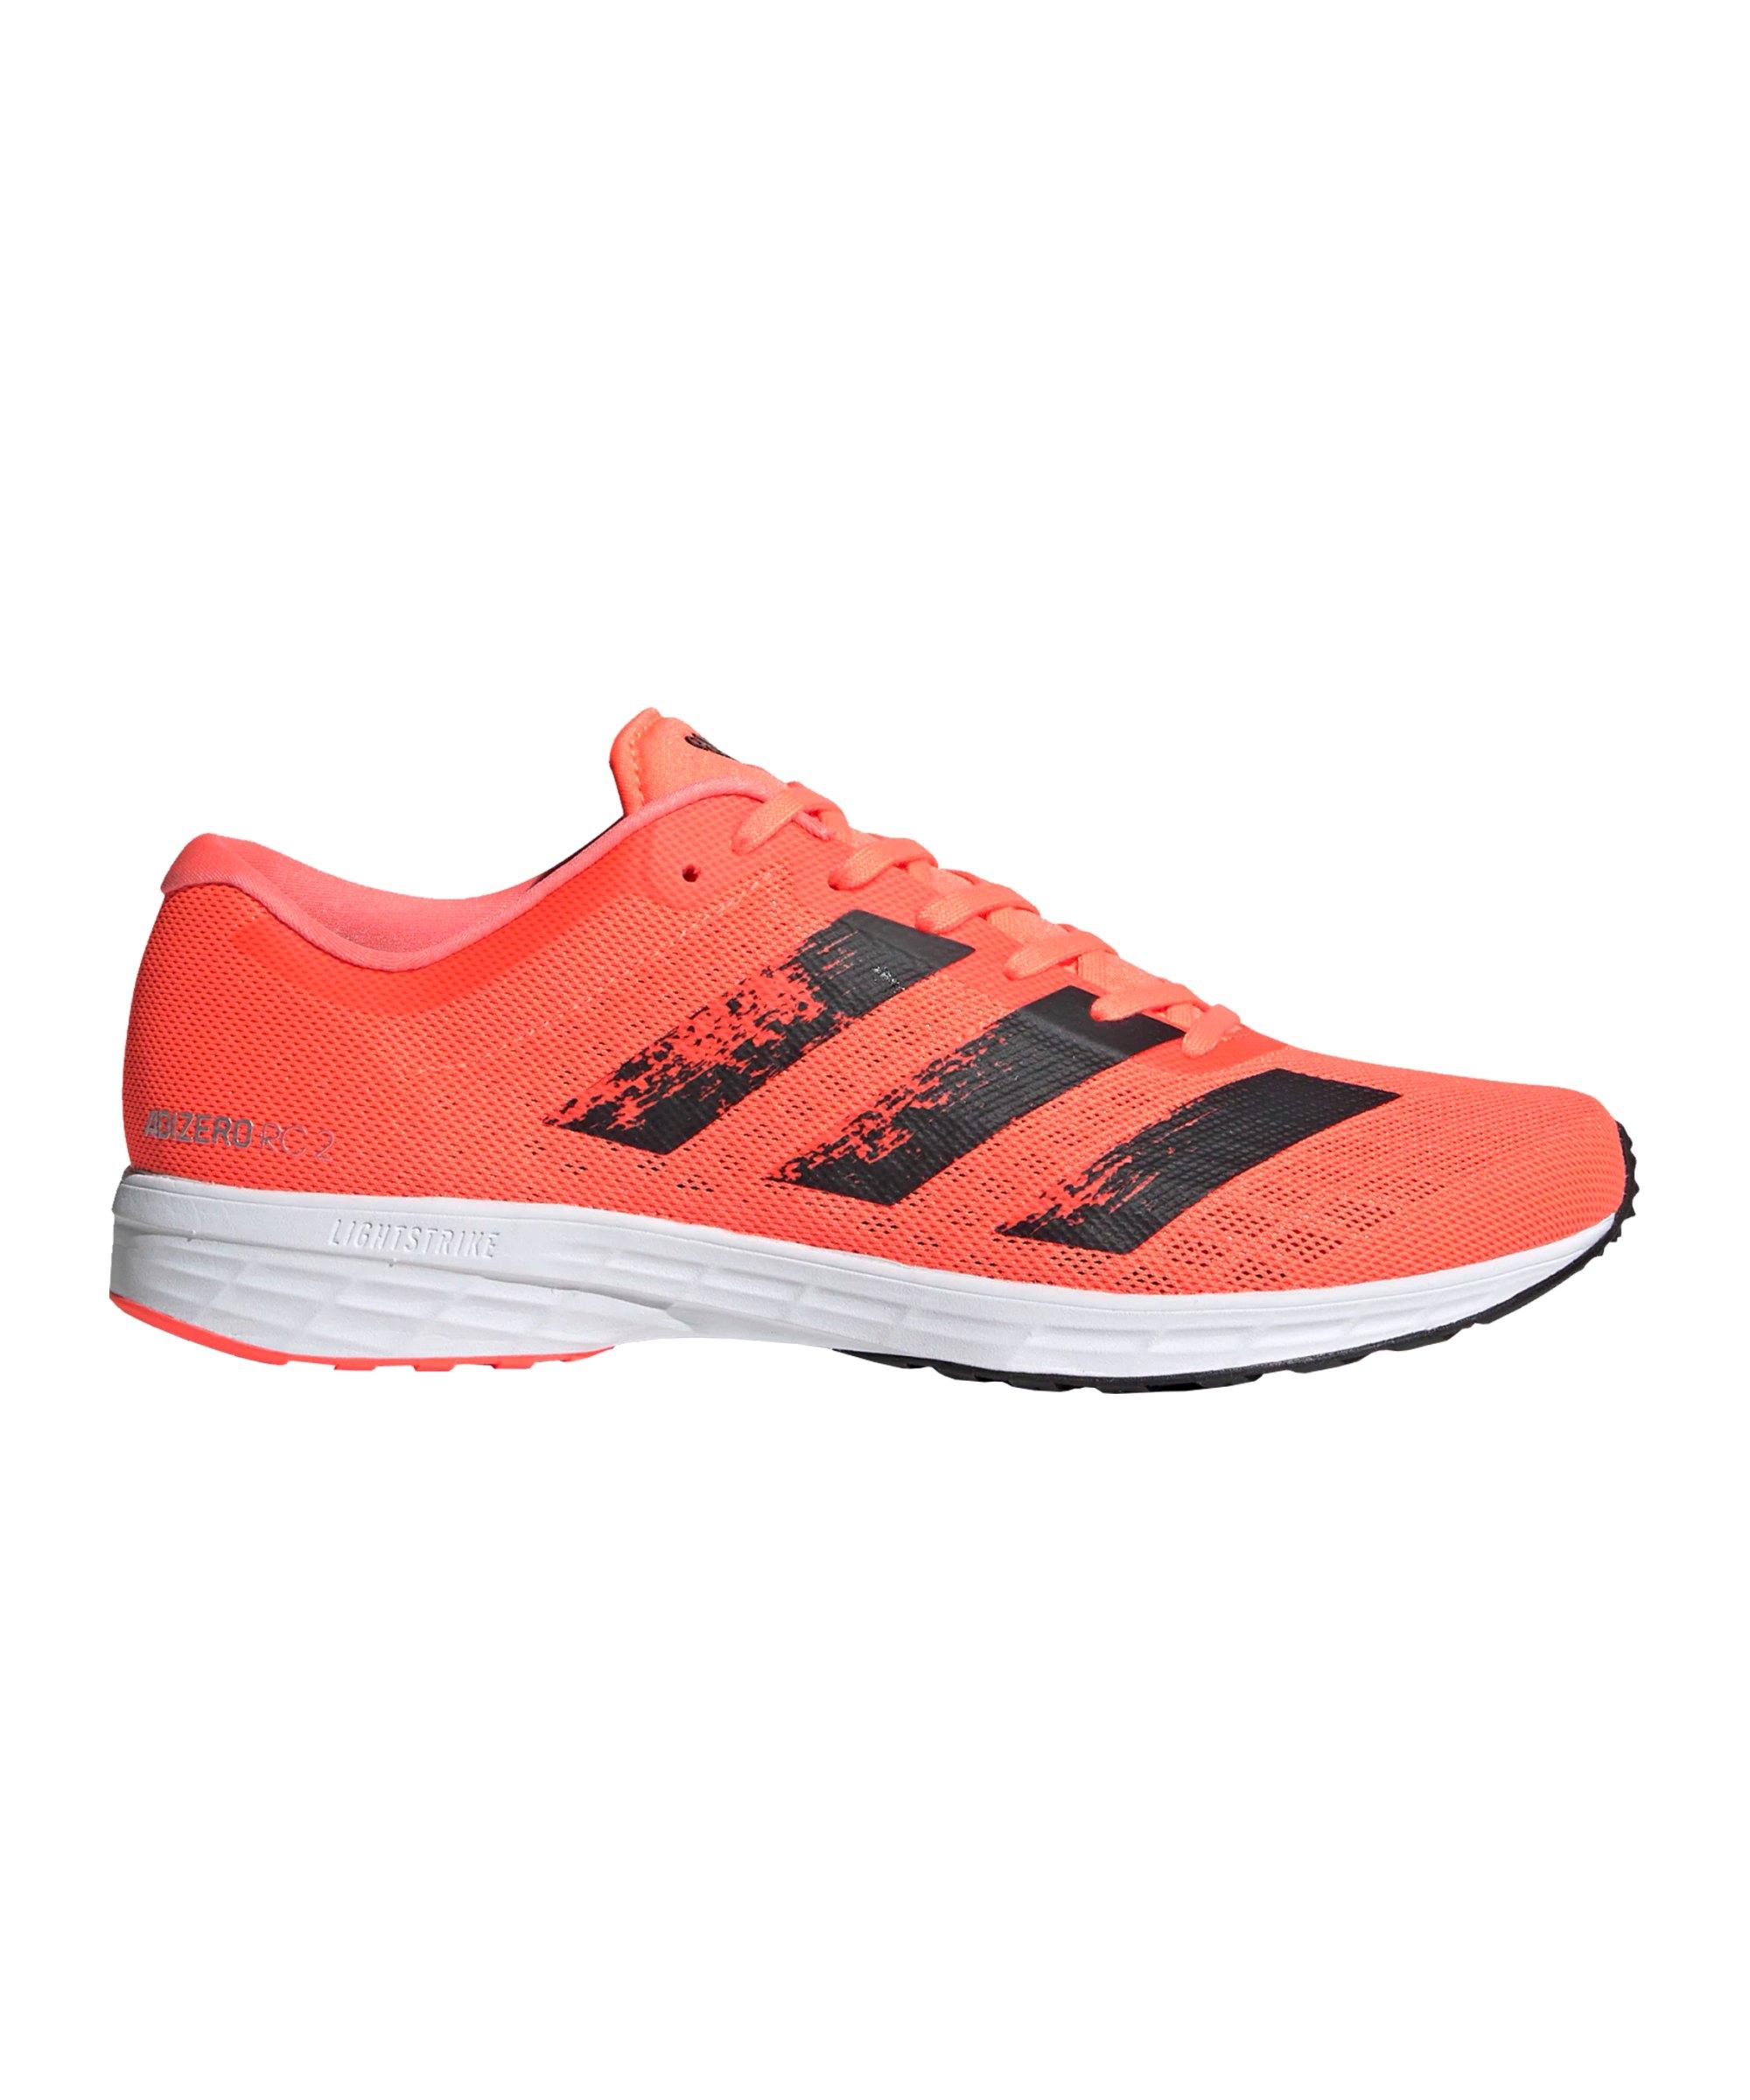 adidas Adizero RC 2 m Running Rot Schwarz - rot